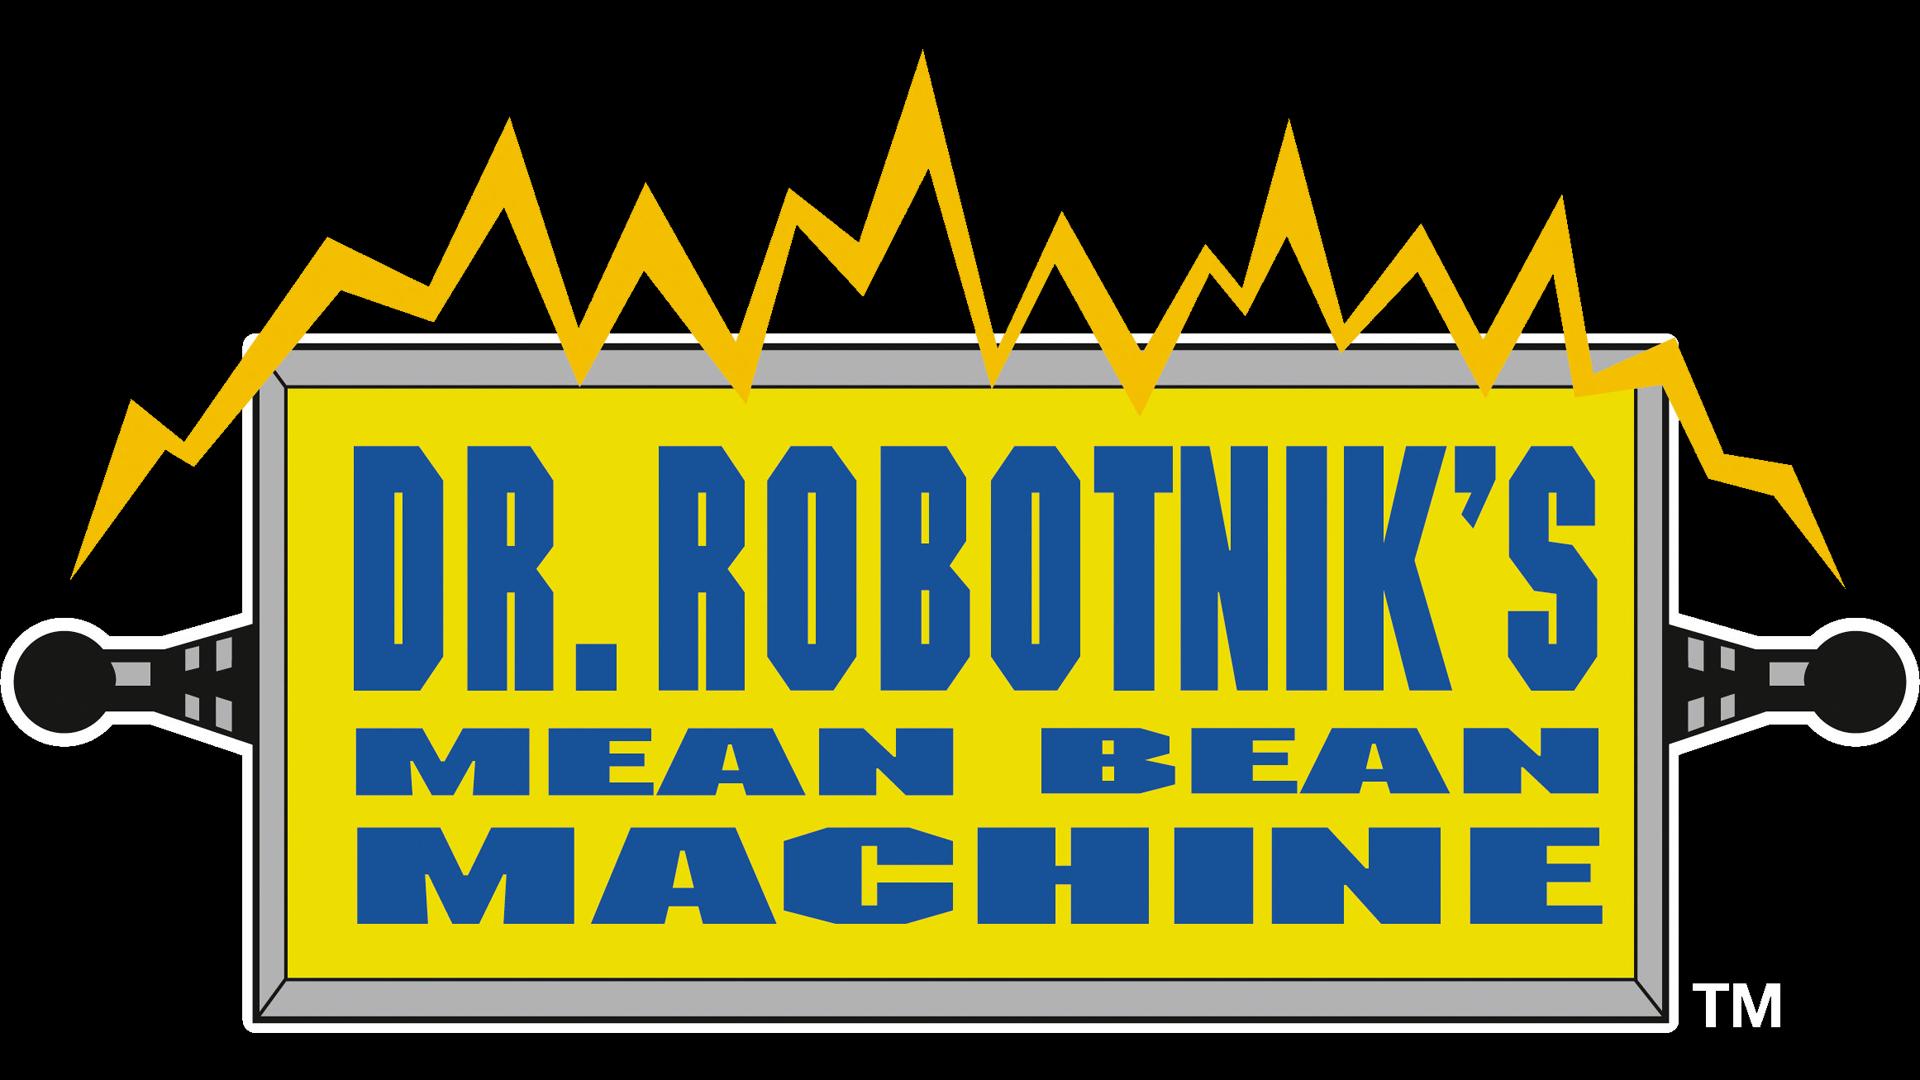 Dr. Robotnik's Mean Bean Machine/Galeria